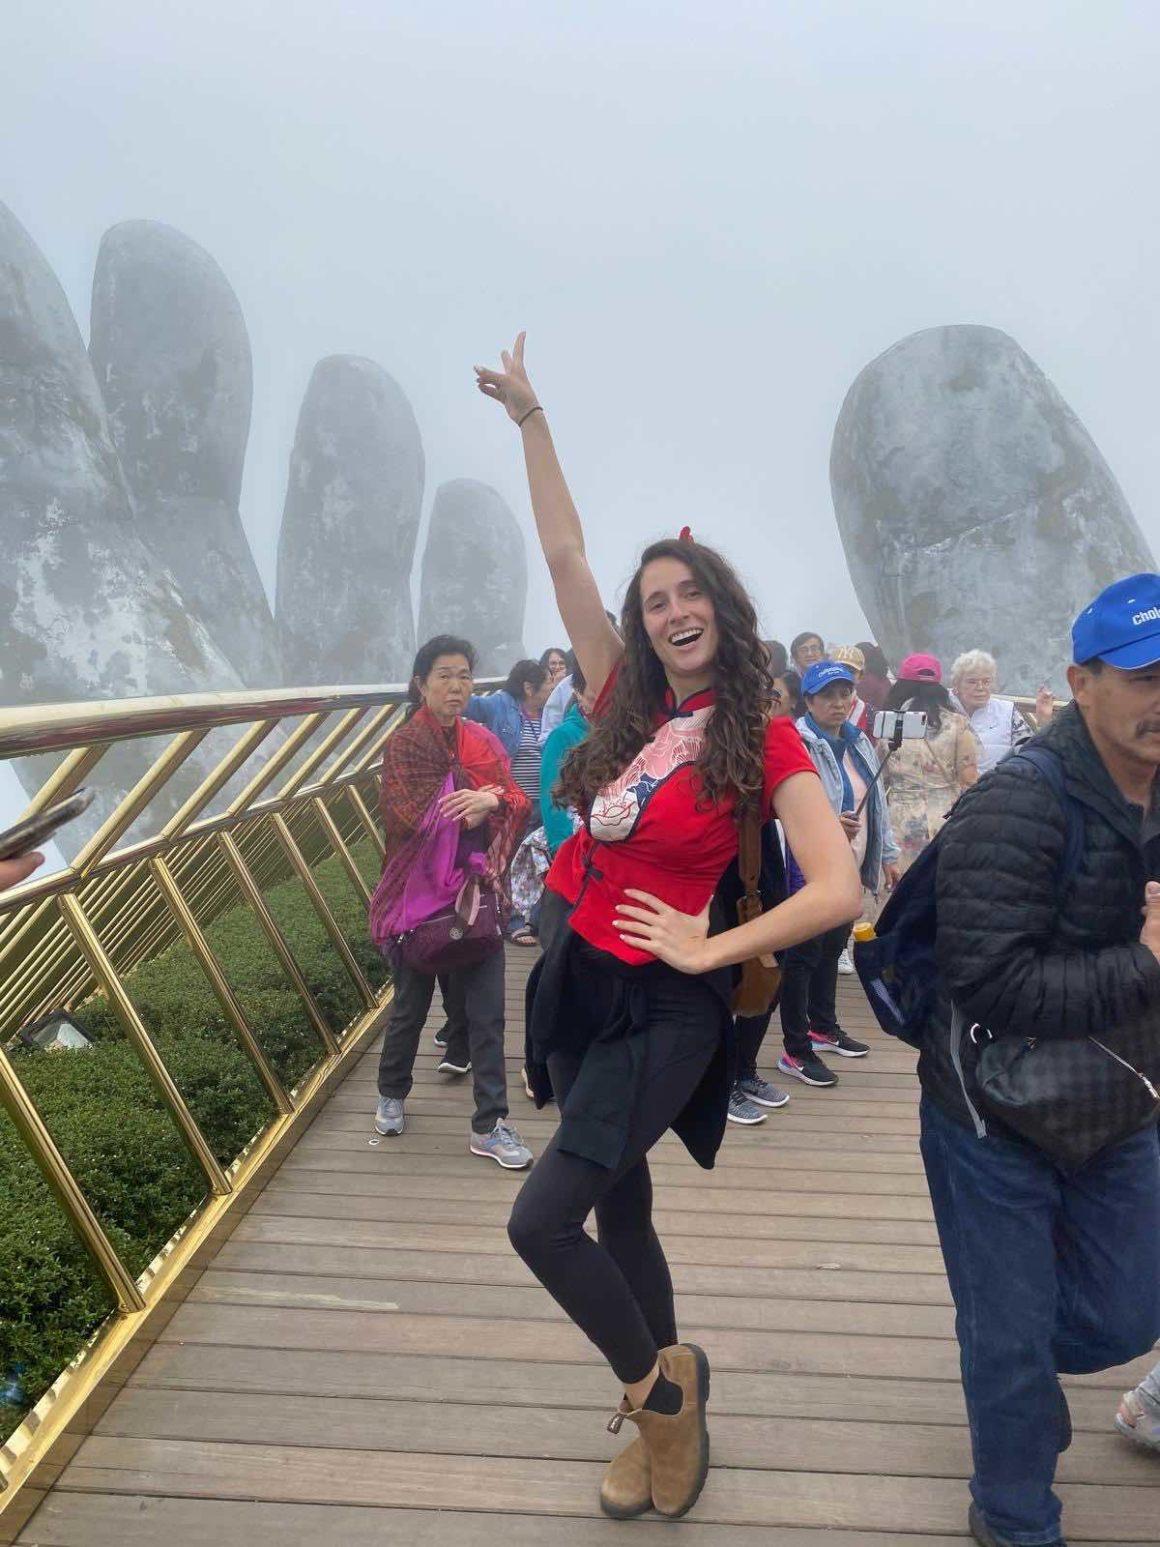 Alyne visiting the famous bridge in vietnam